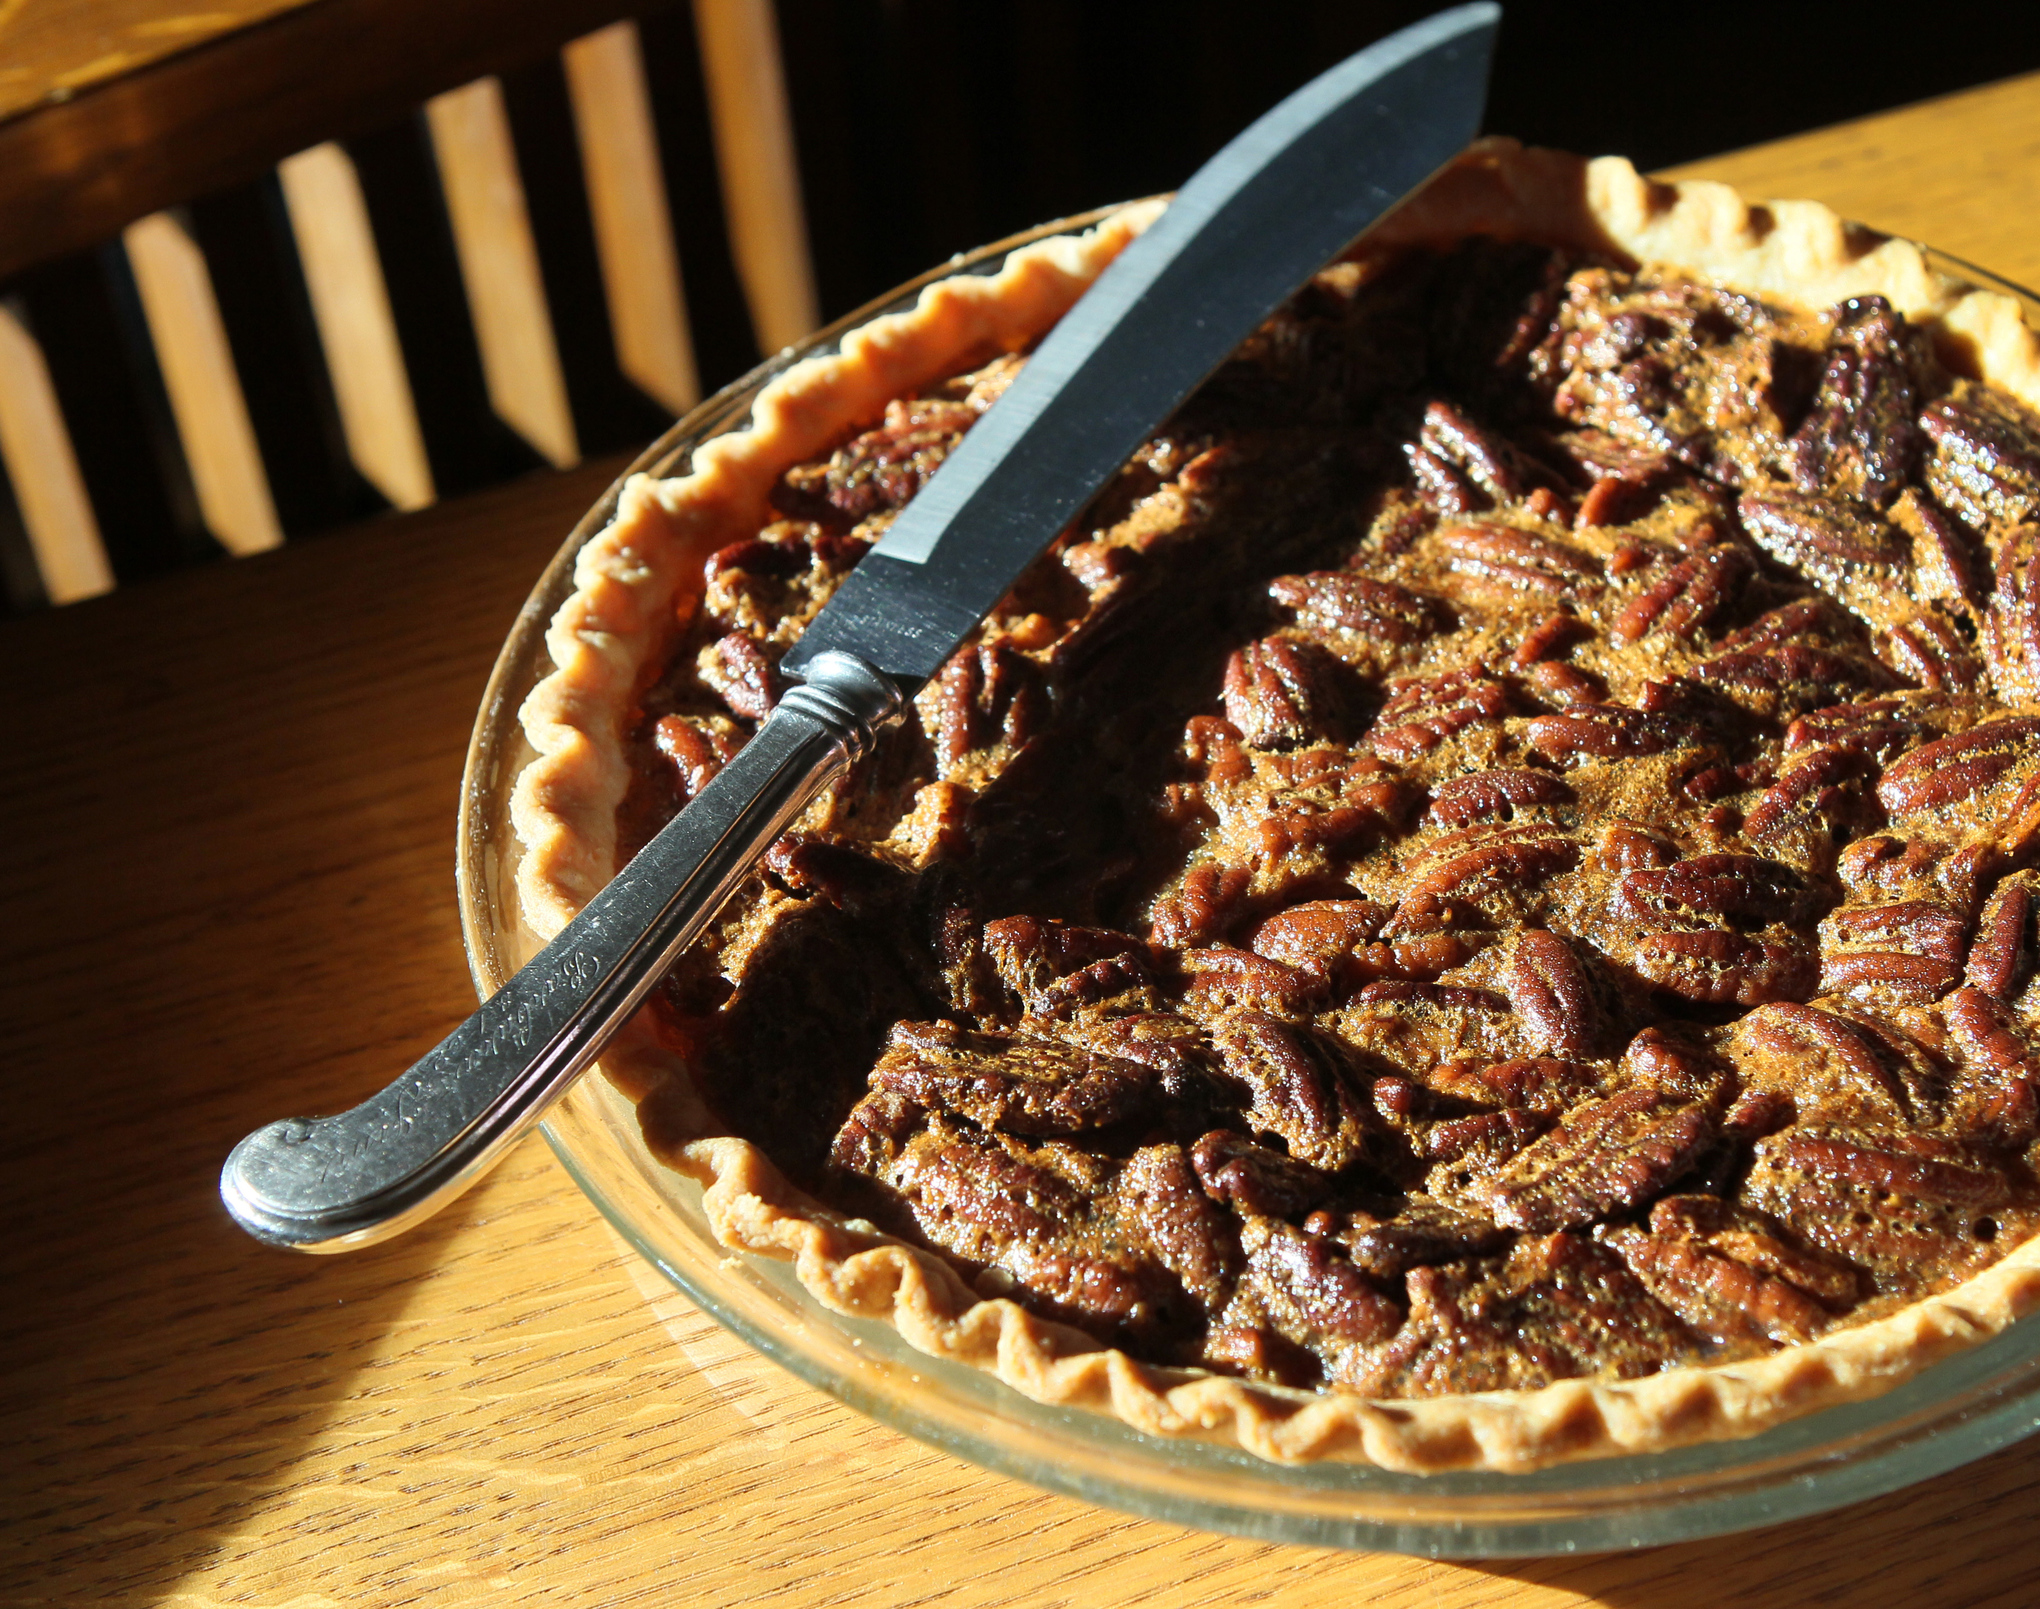 pecan pie. A true American treat. Photo by Boston Globe/Getty